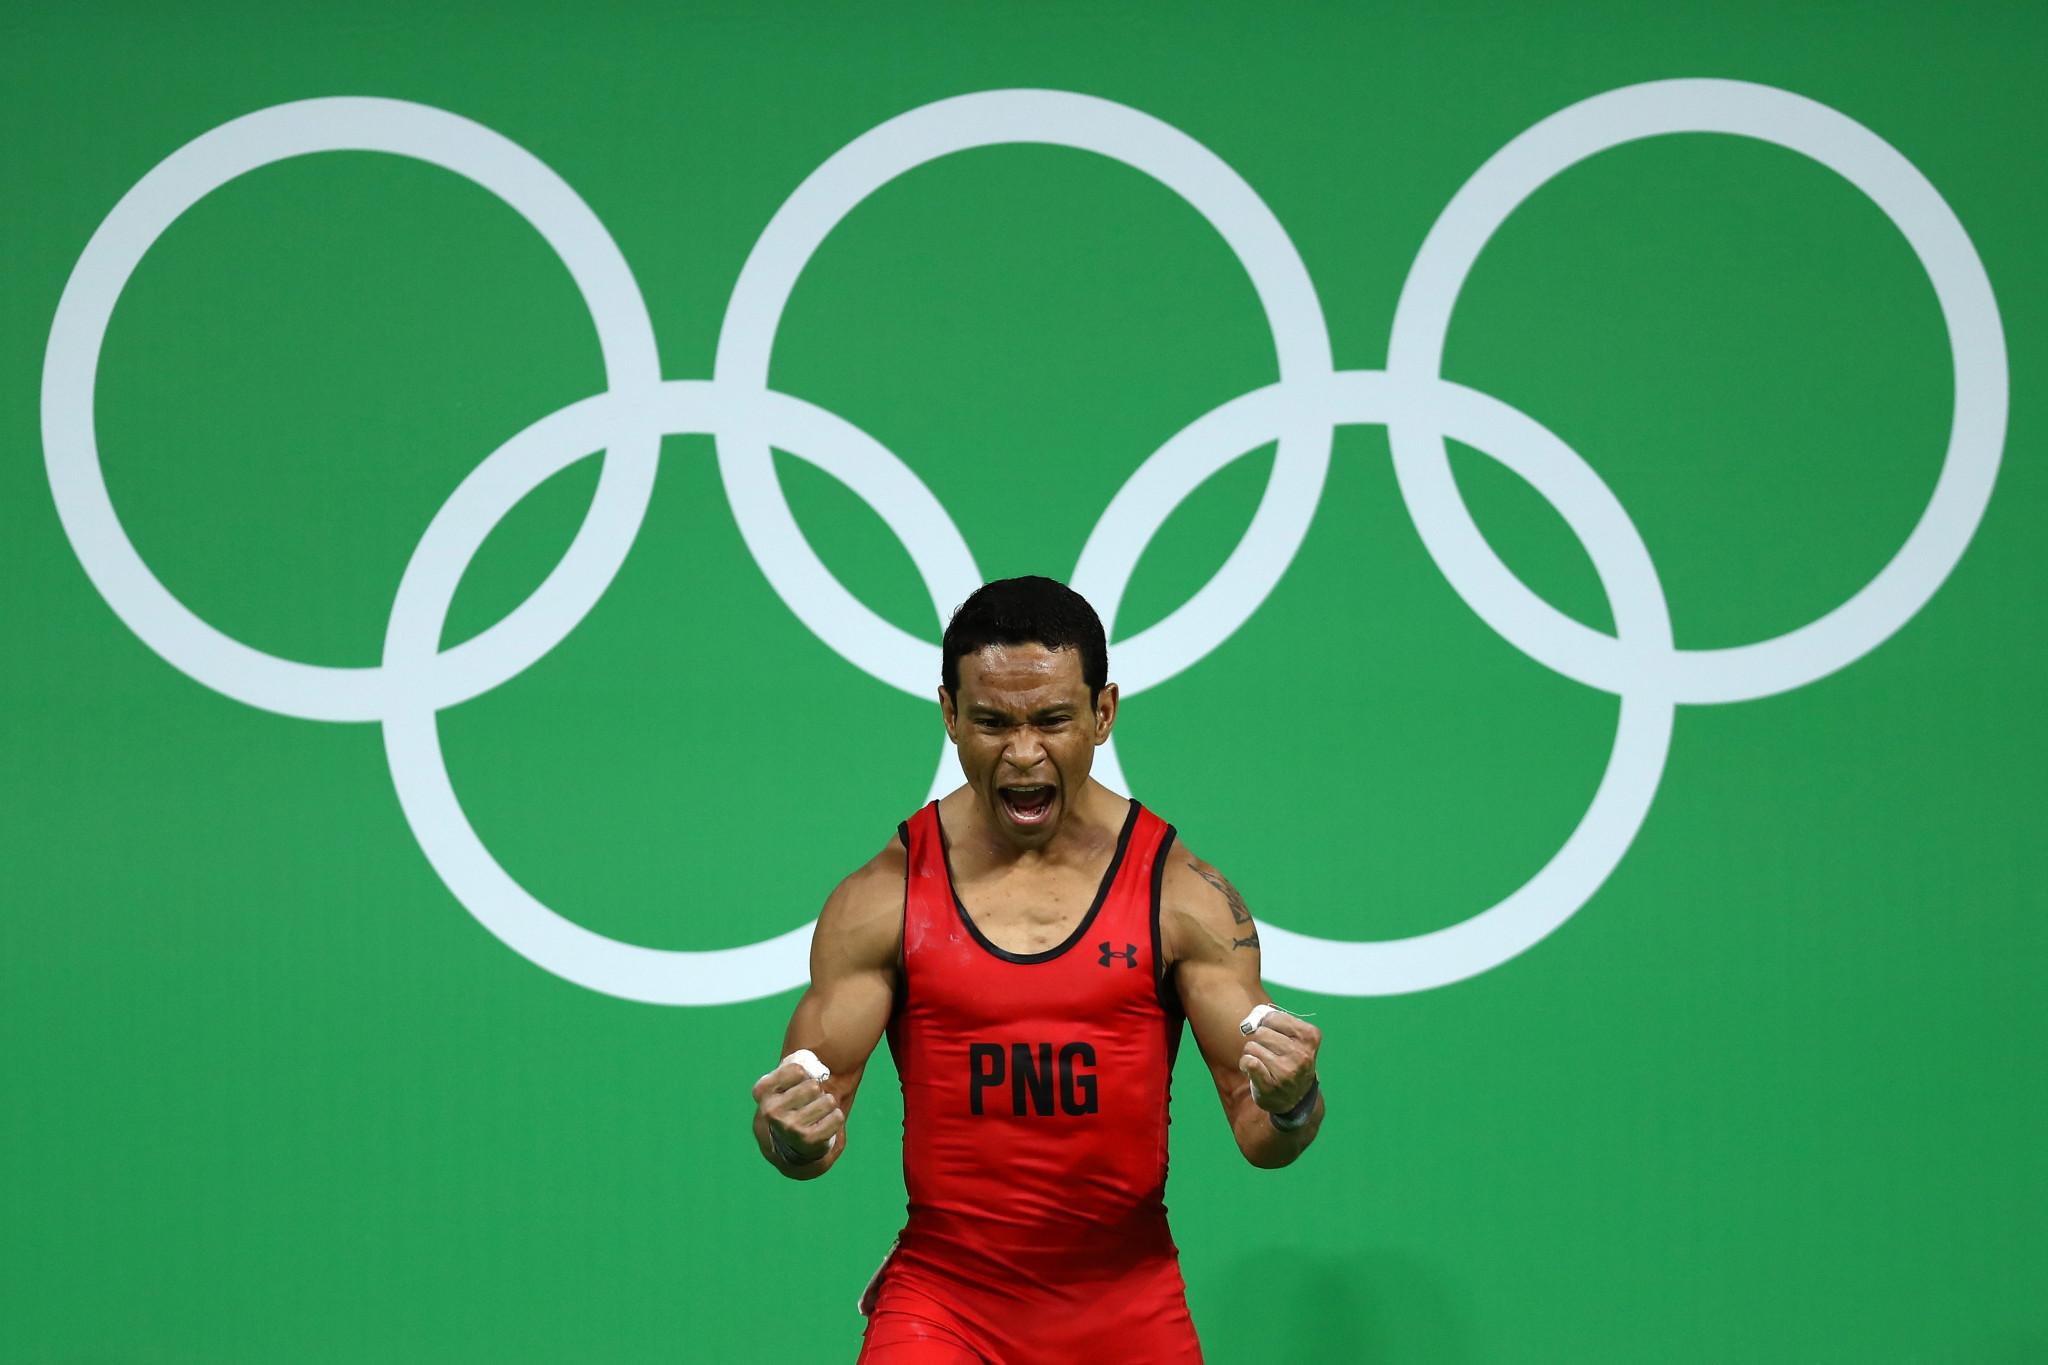 Papua New Guinea athletes seek permission to train for Tokyo 2020 in Australia